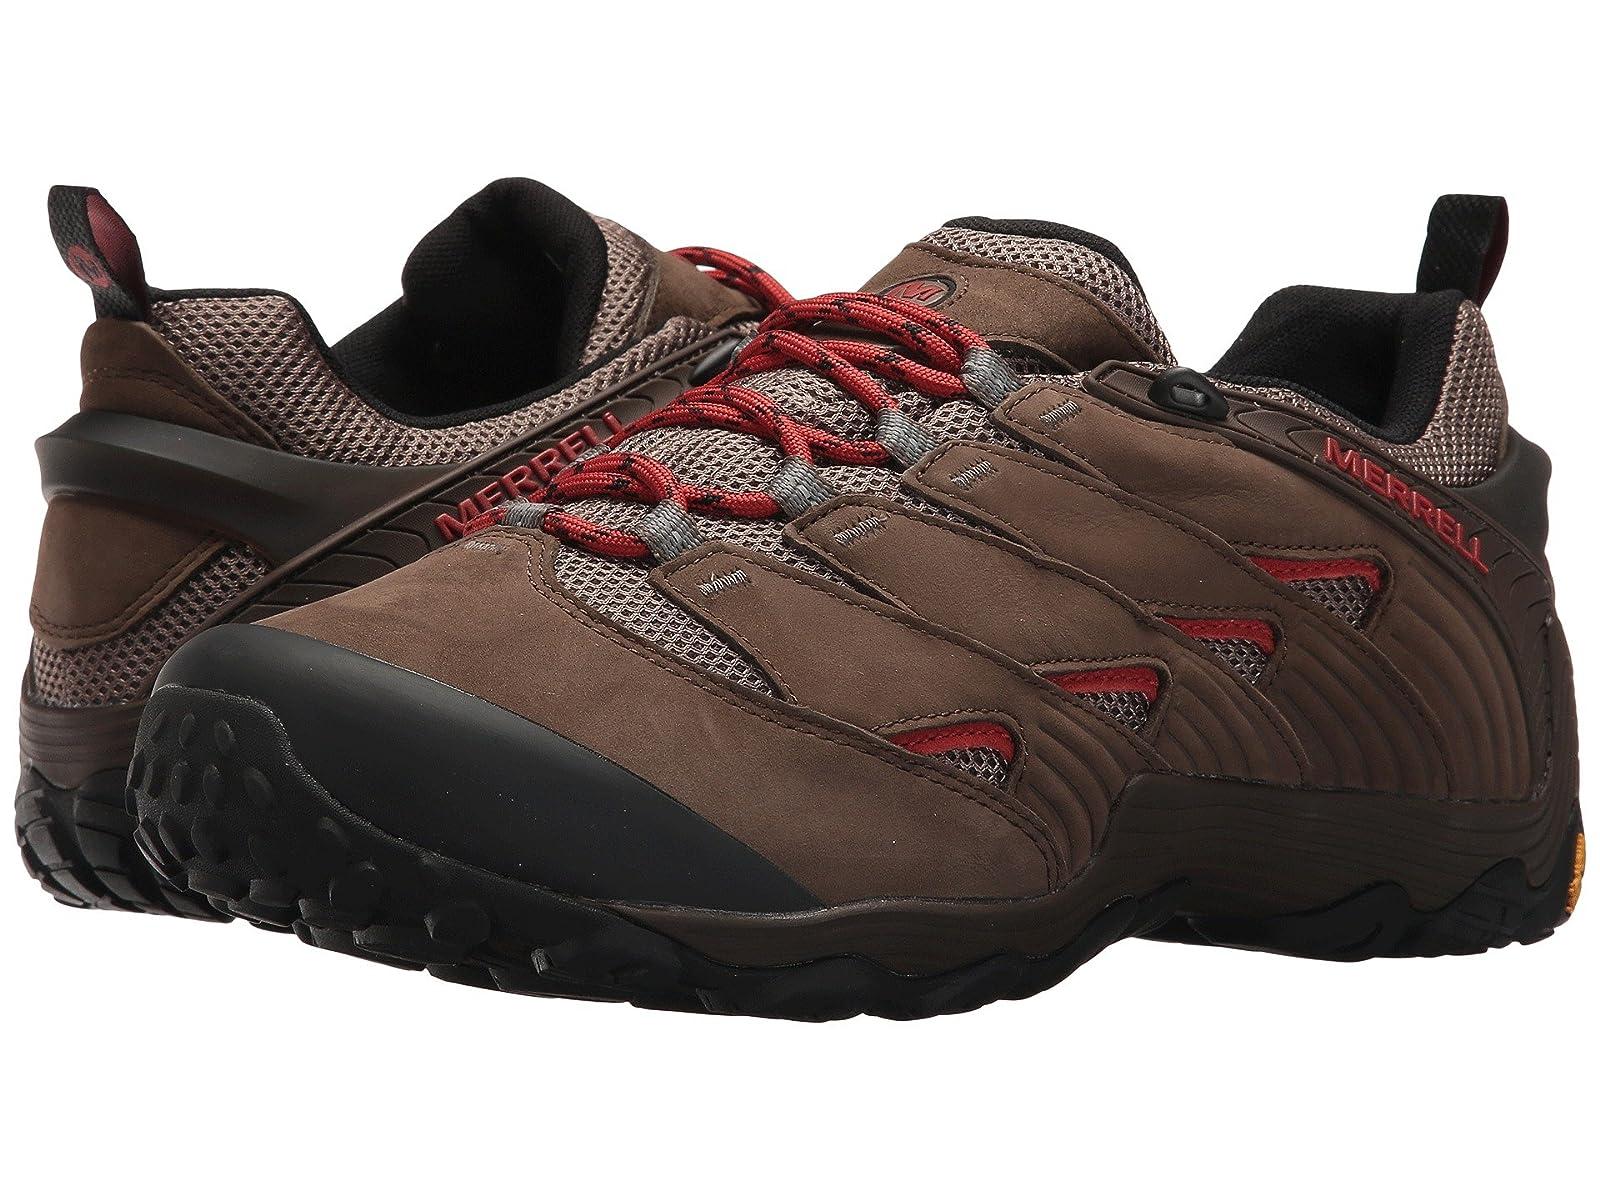 Merrell Chameleon 7Atmospheric grades have affordable shoes